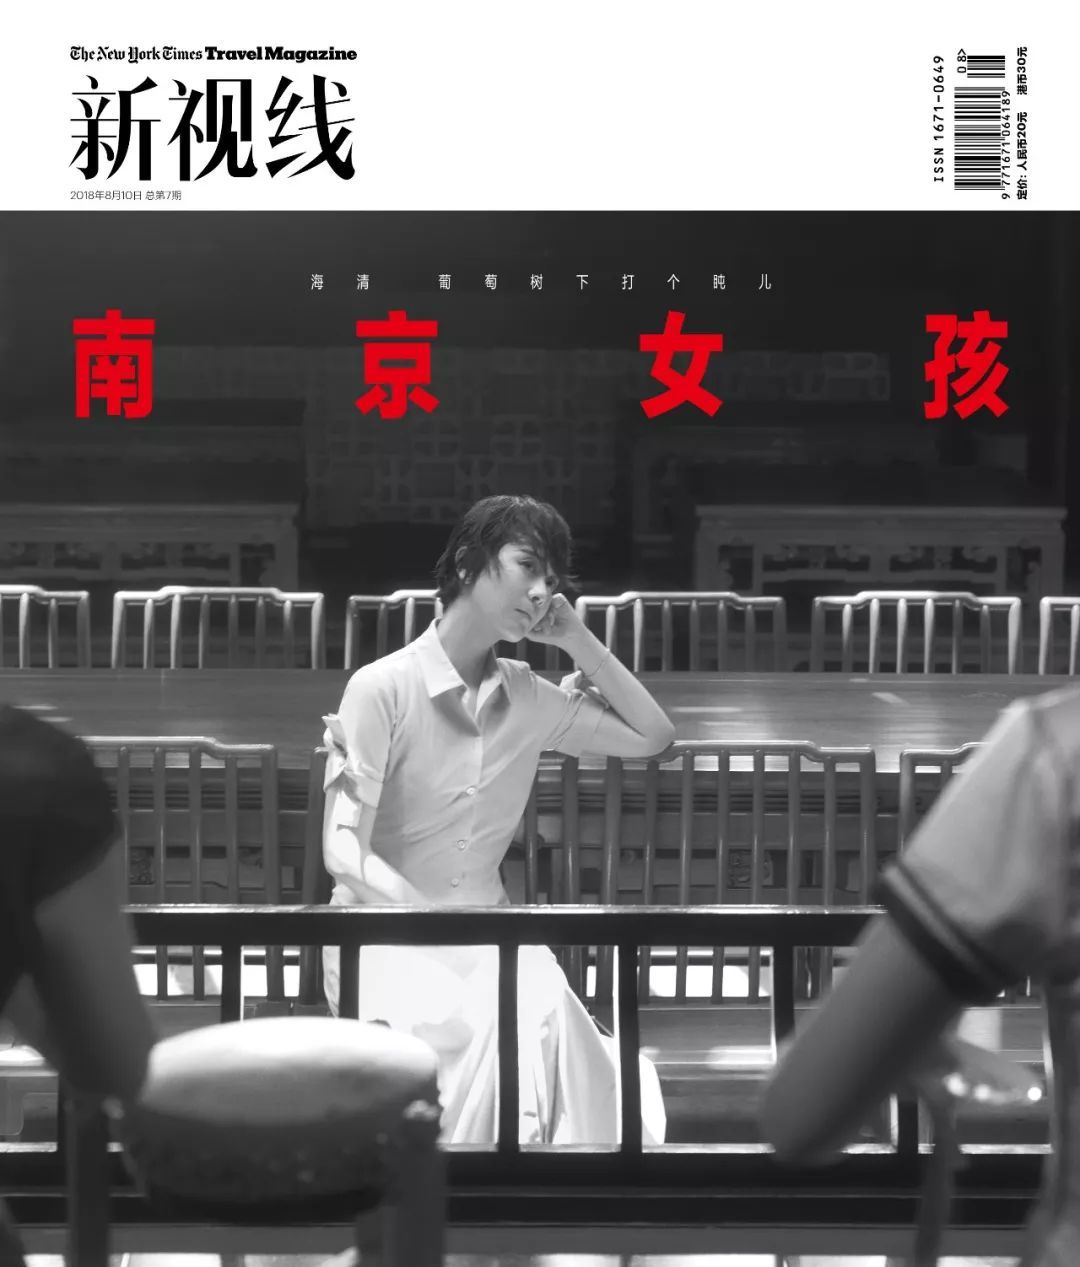 《NY Times Travel新视线》南京女孩-海清